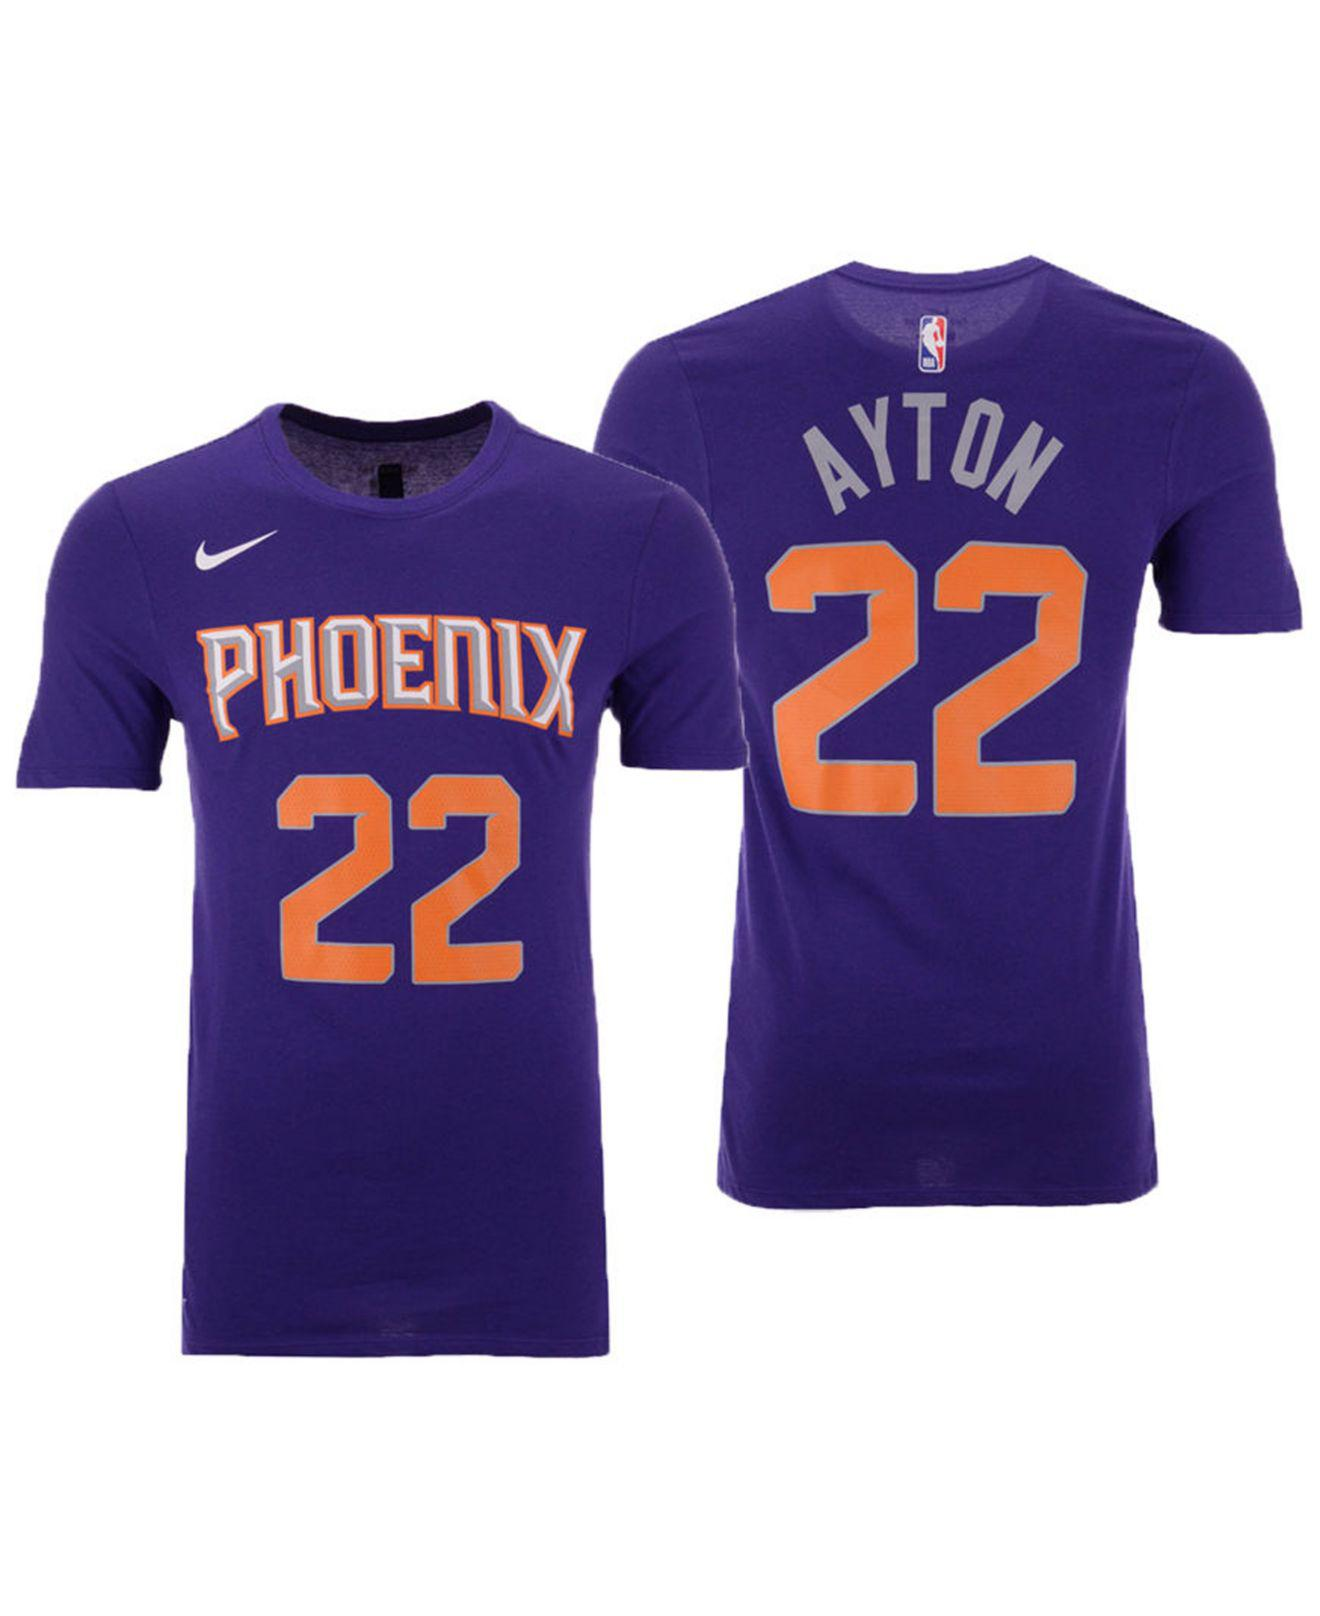 7da45ed9b Nike Deandre Ayton Phoenix Suns Icon Player T-shirt in Purple for ...